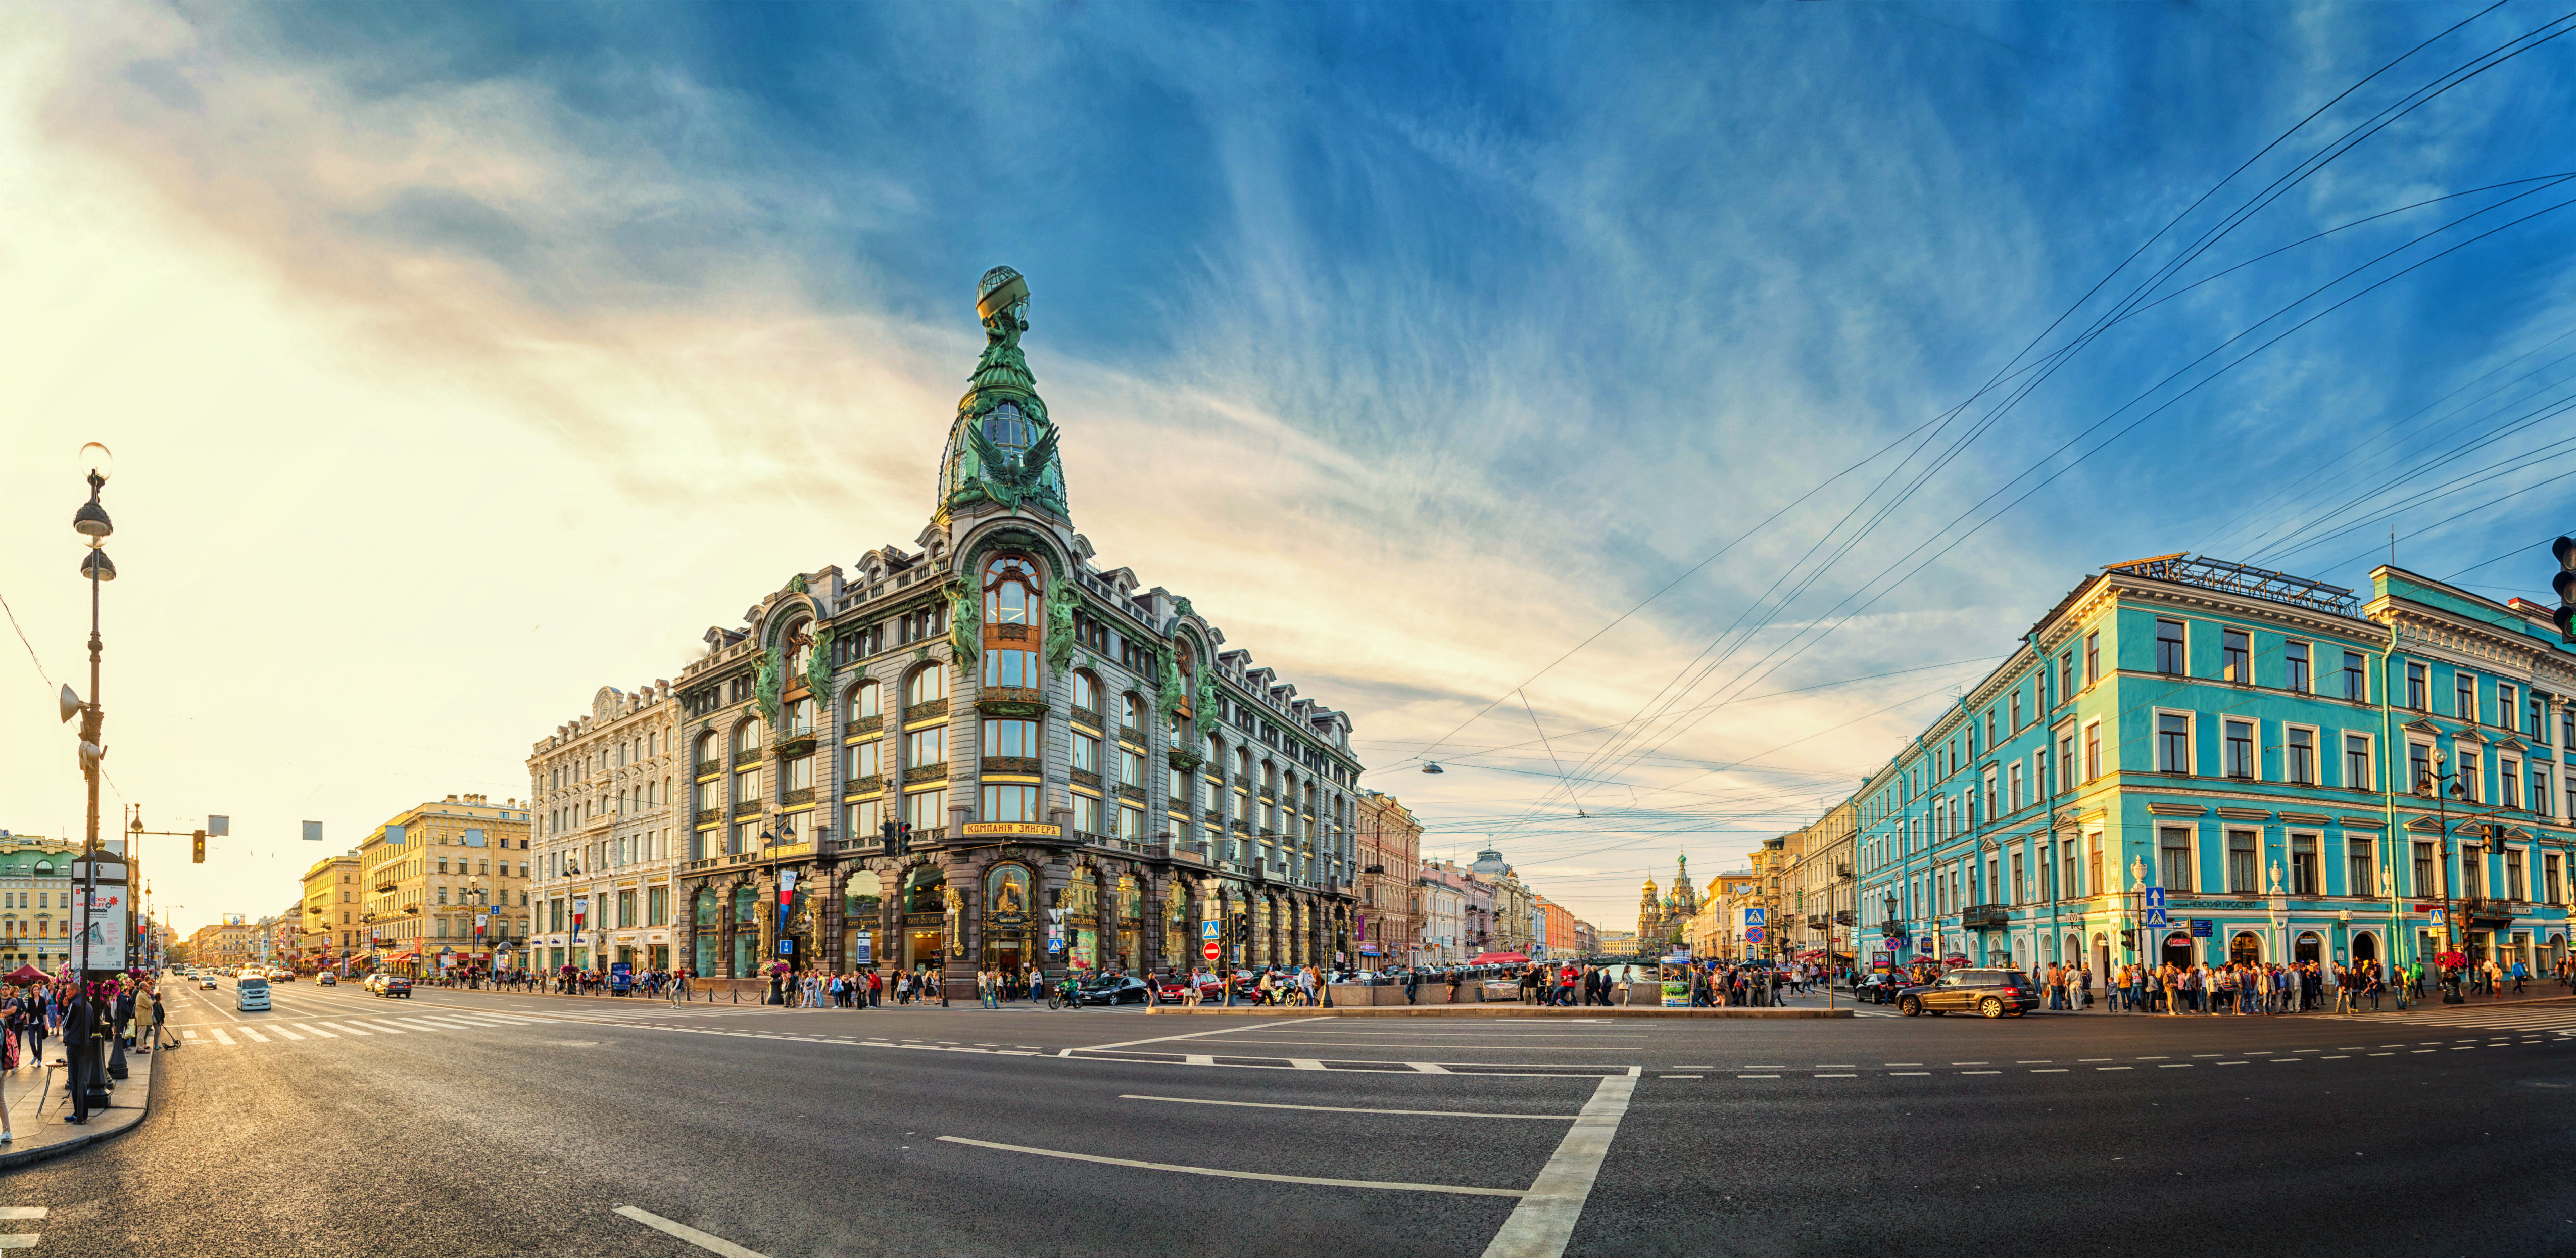 Nevsky Prospekt | St Petersburg, Russia Attractions ...